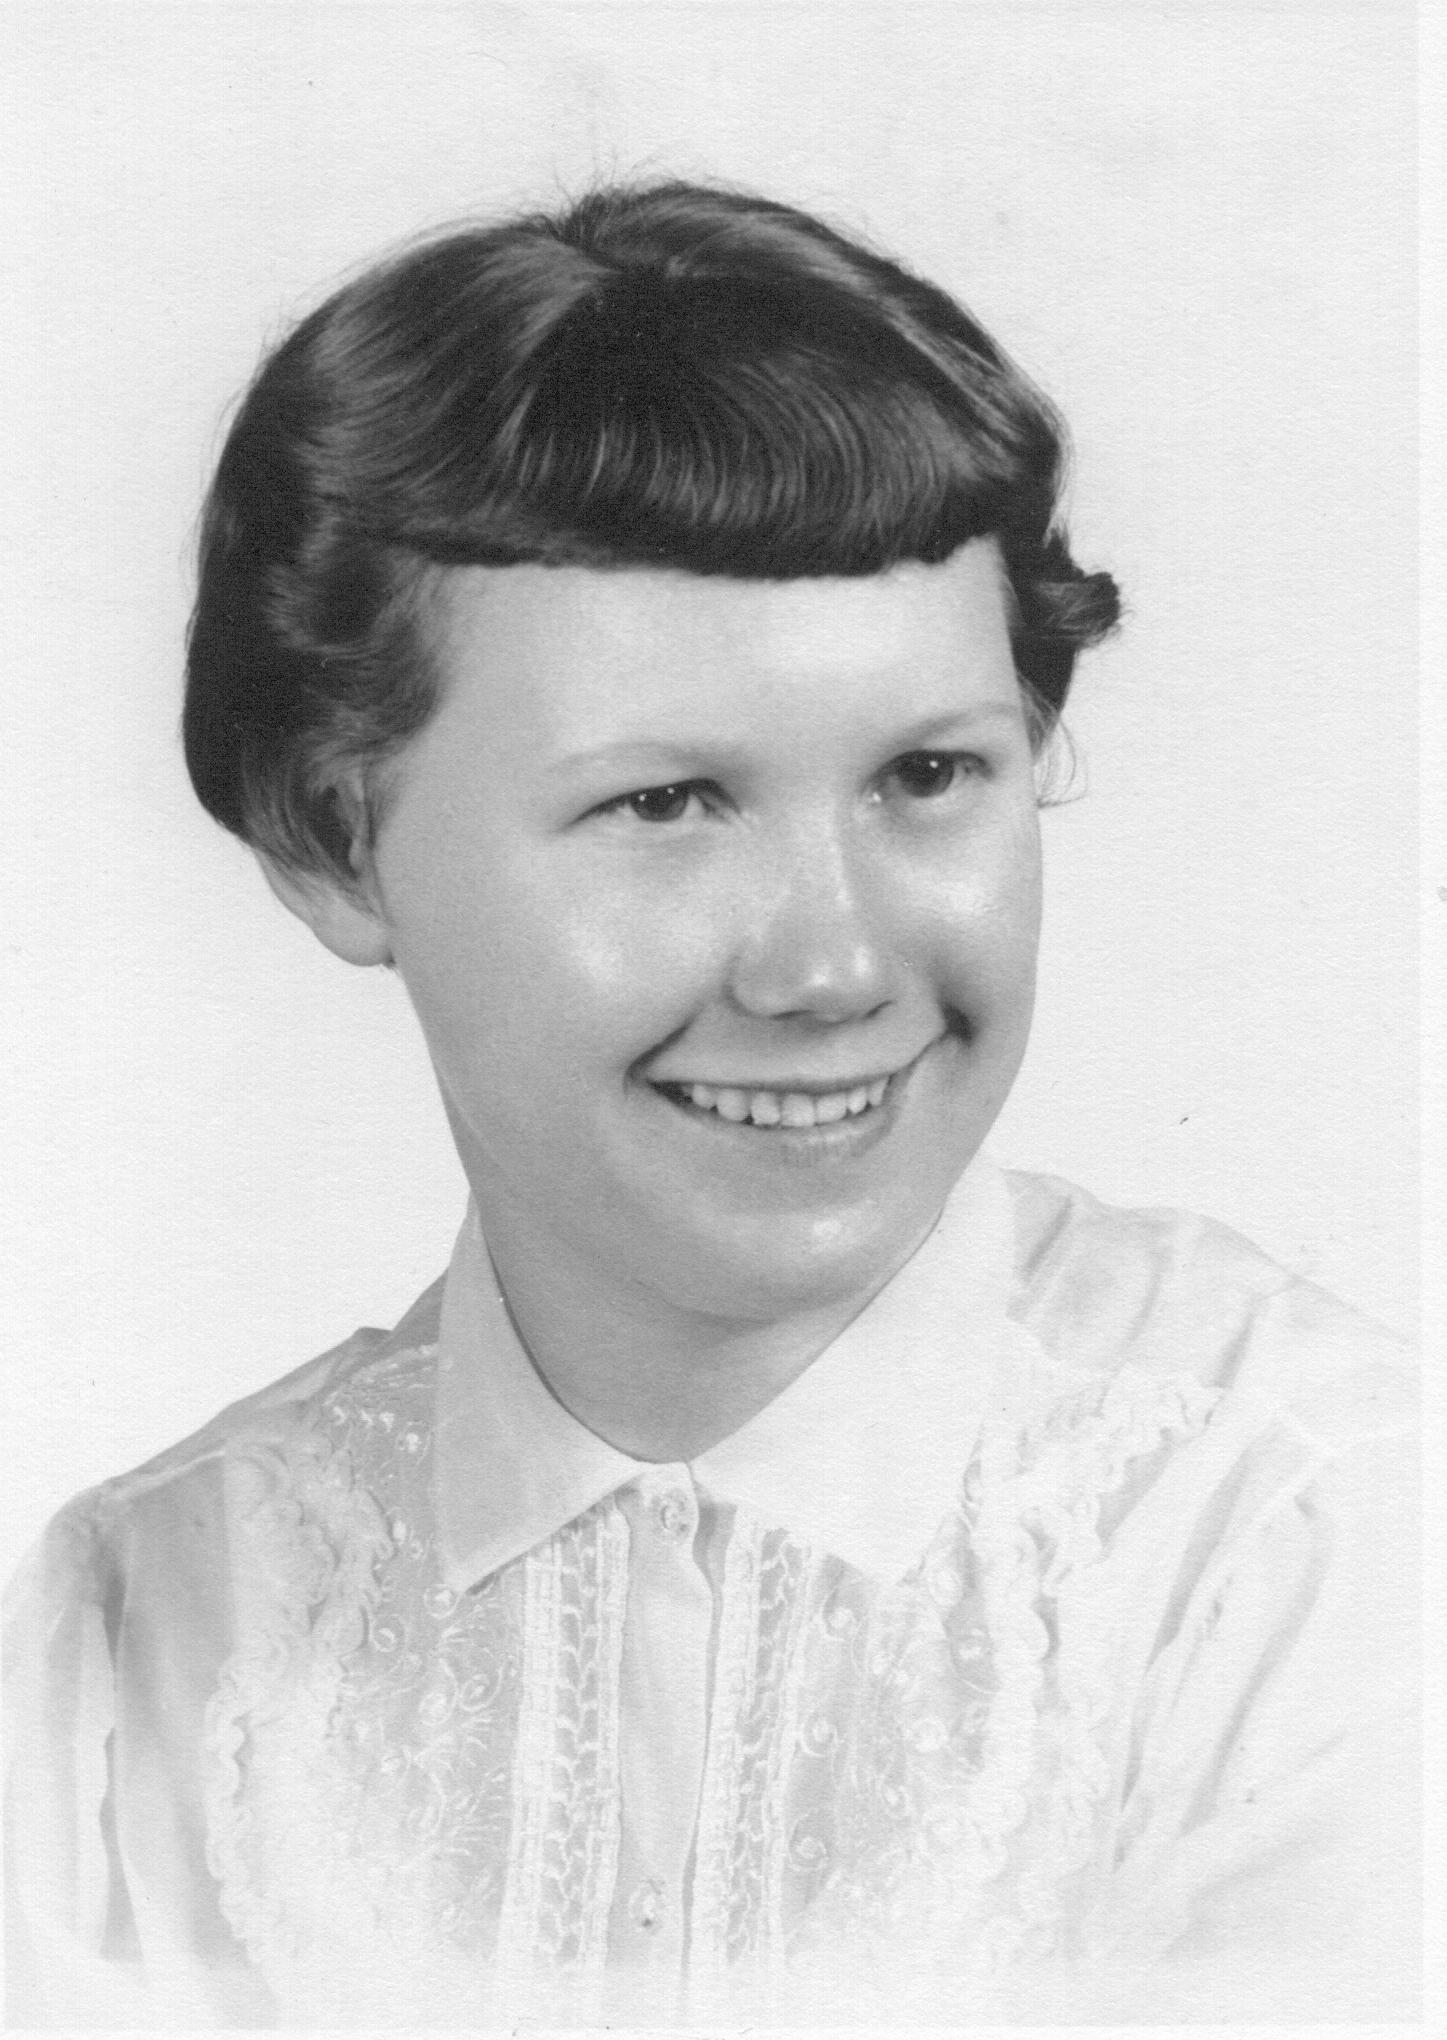 Nancy Lee Thoburn, HS Graduation 1956